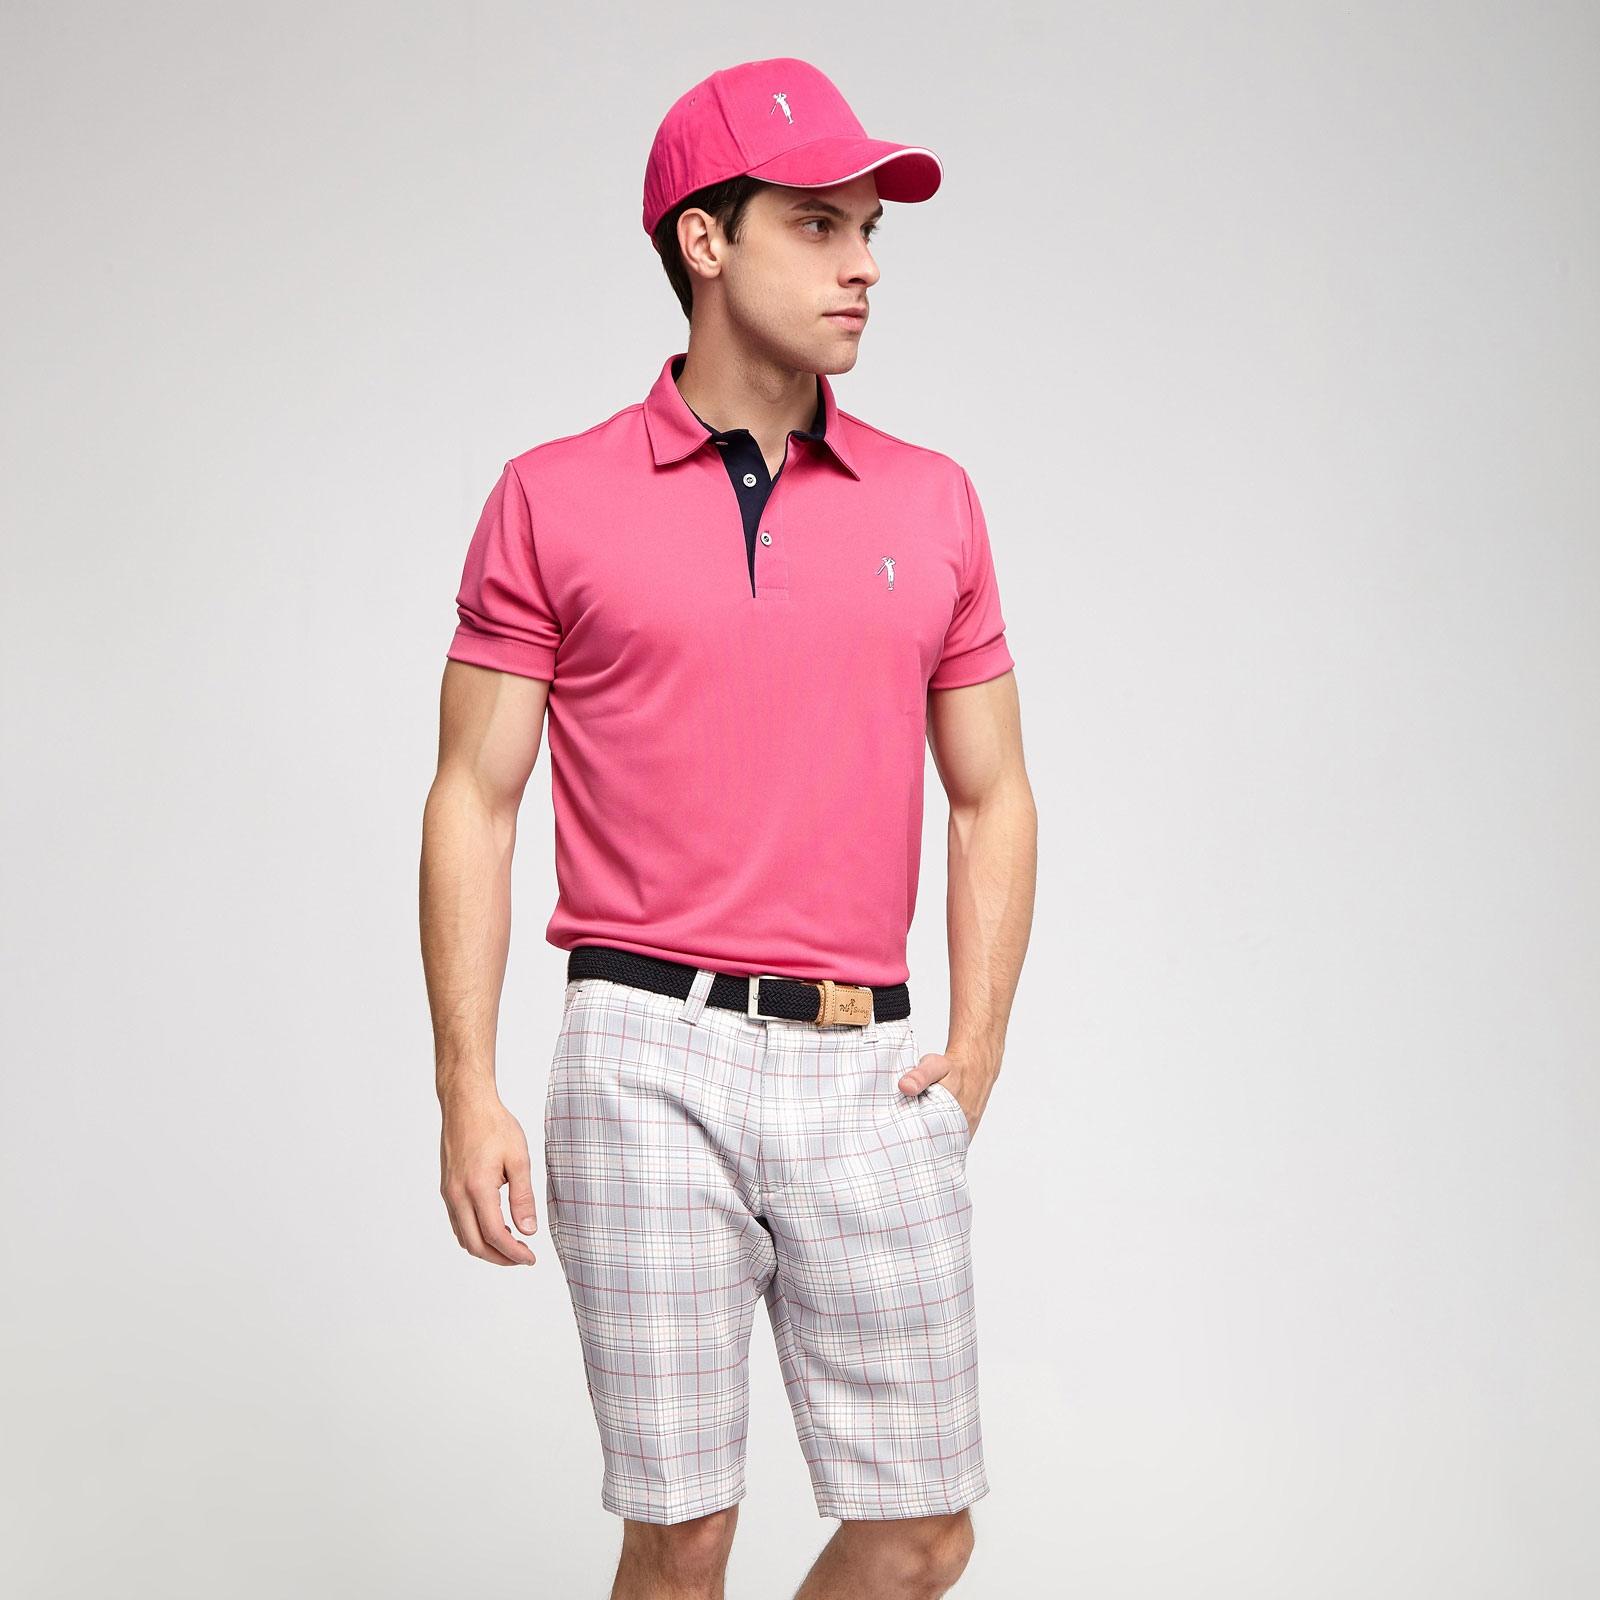 Primavera 2019 ropa de golf